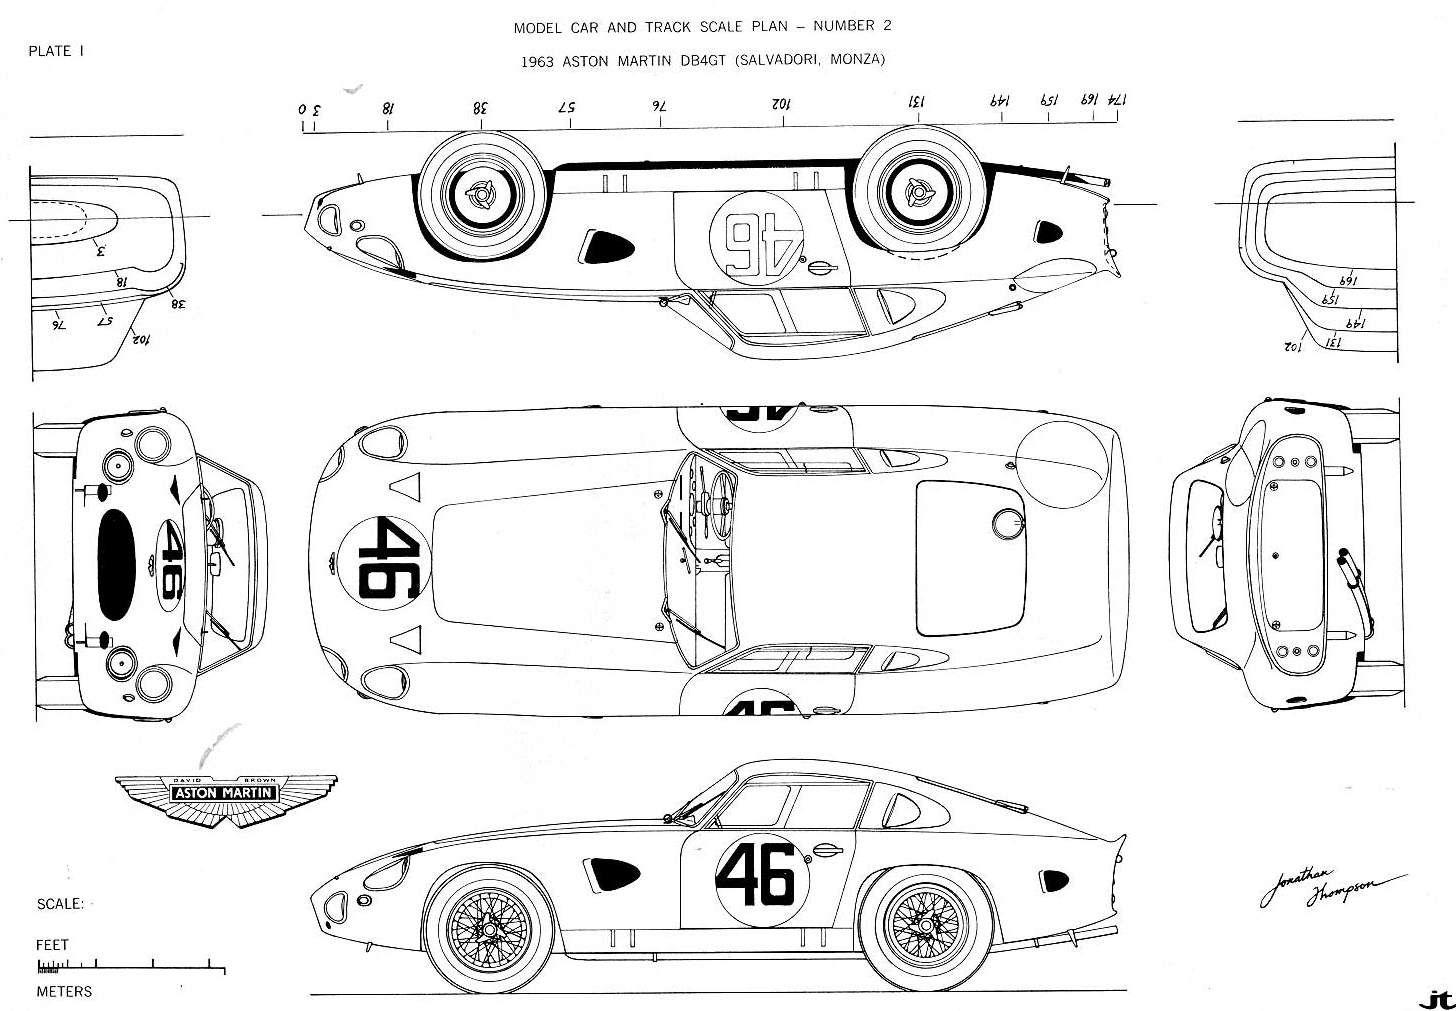 Aston Martin Db4 Gt Dp 214 Chassis R 1 456